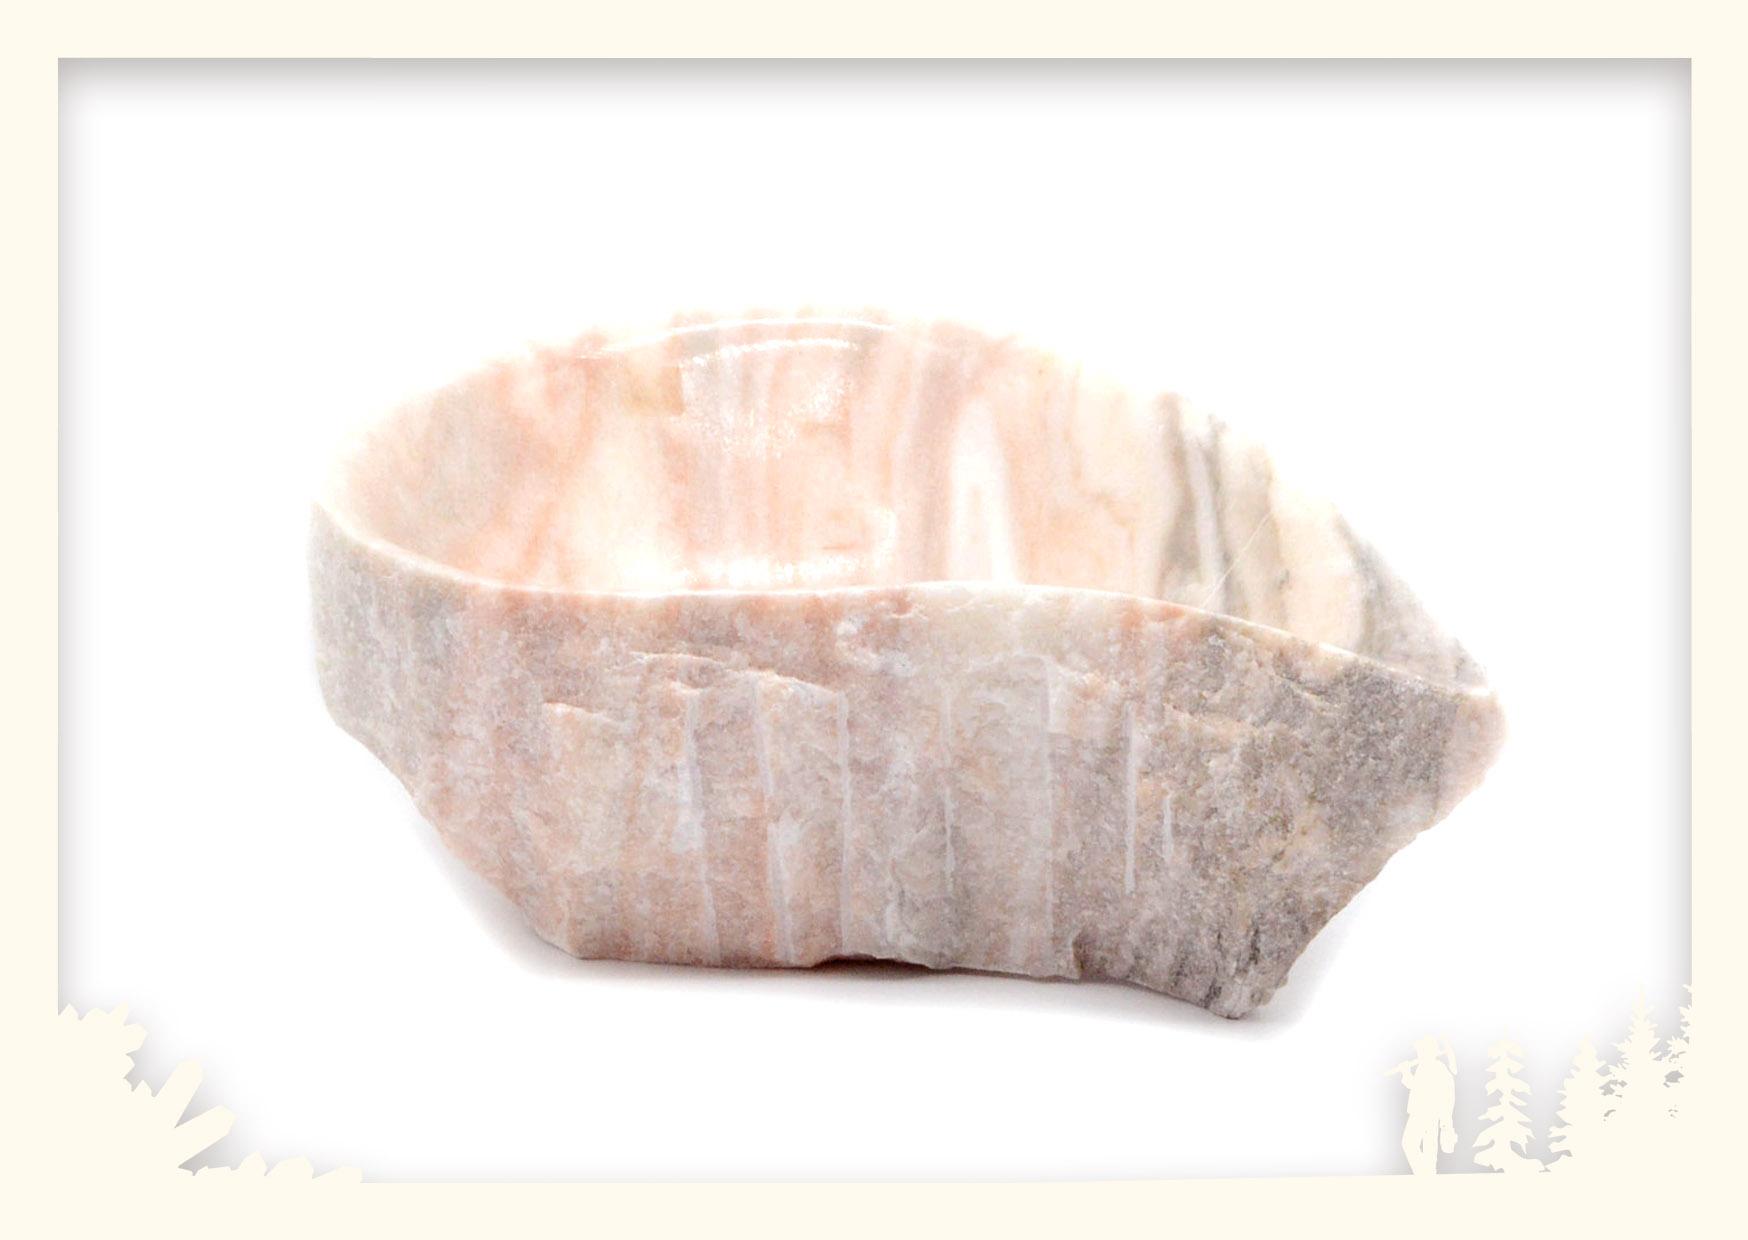 Schale Sölker Marmor Image